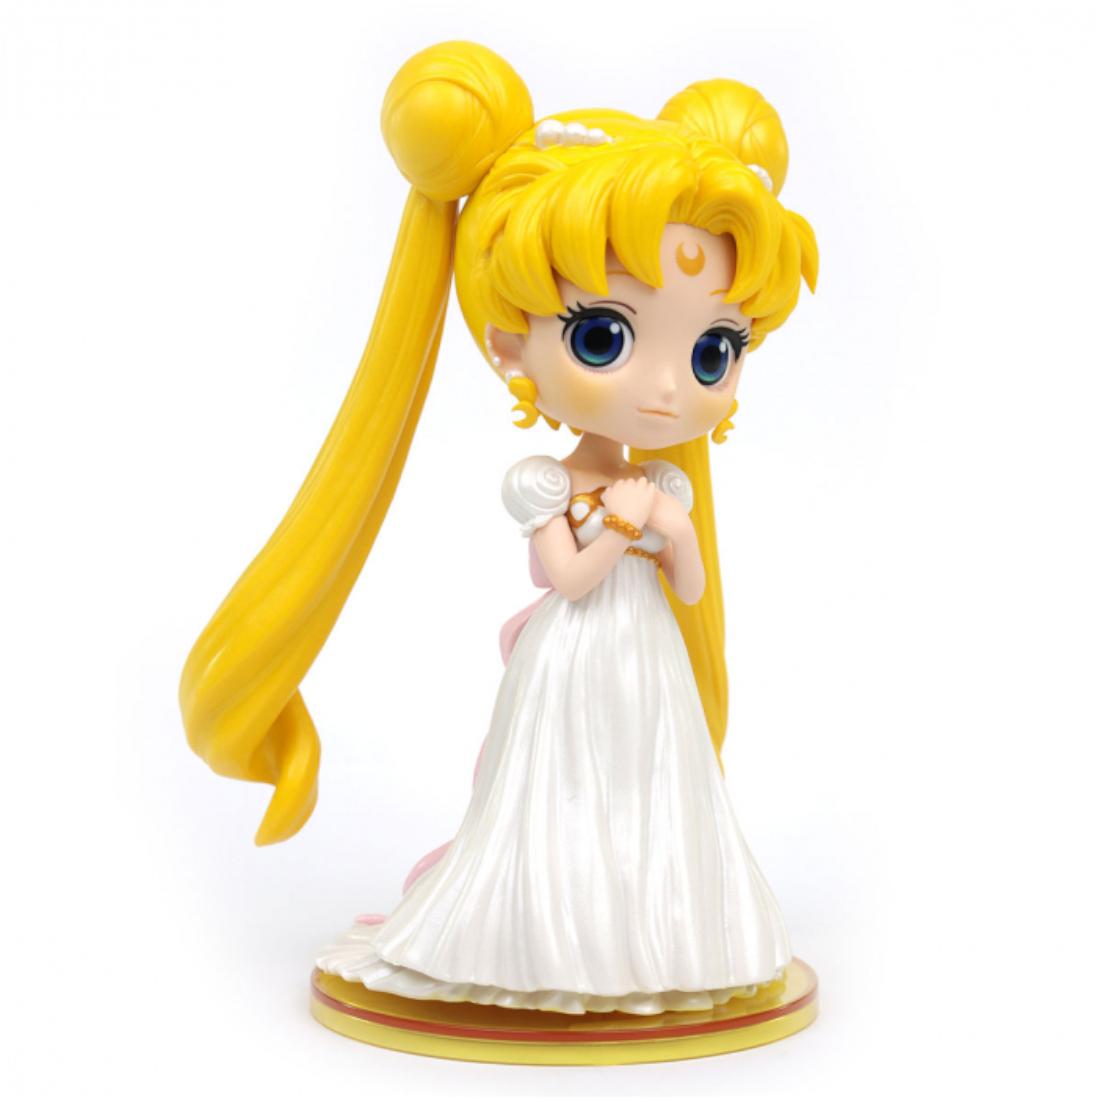 Banpresto Sailor Moon Qposket Princess Serenity